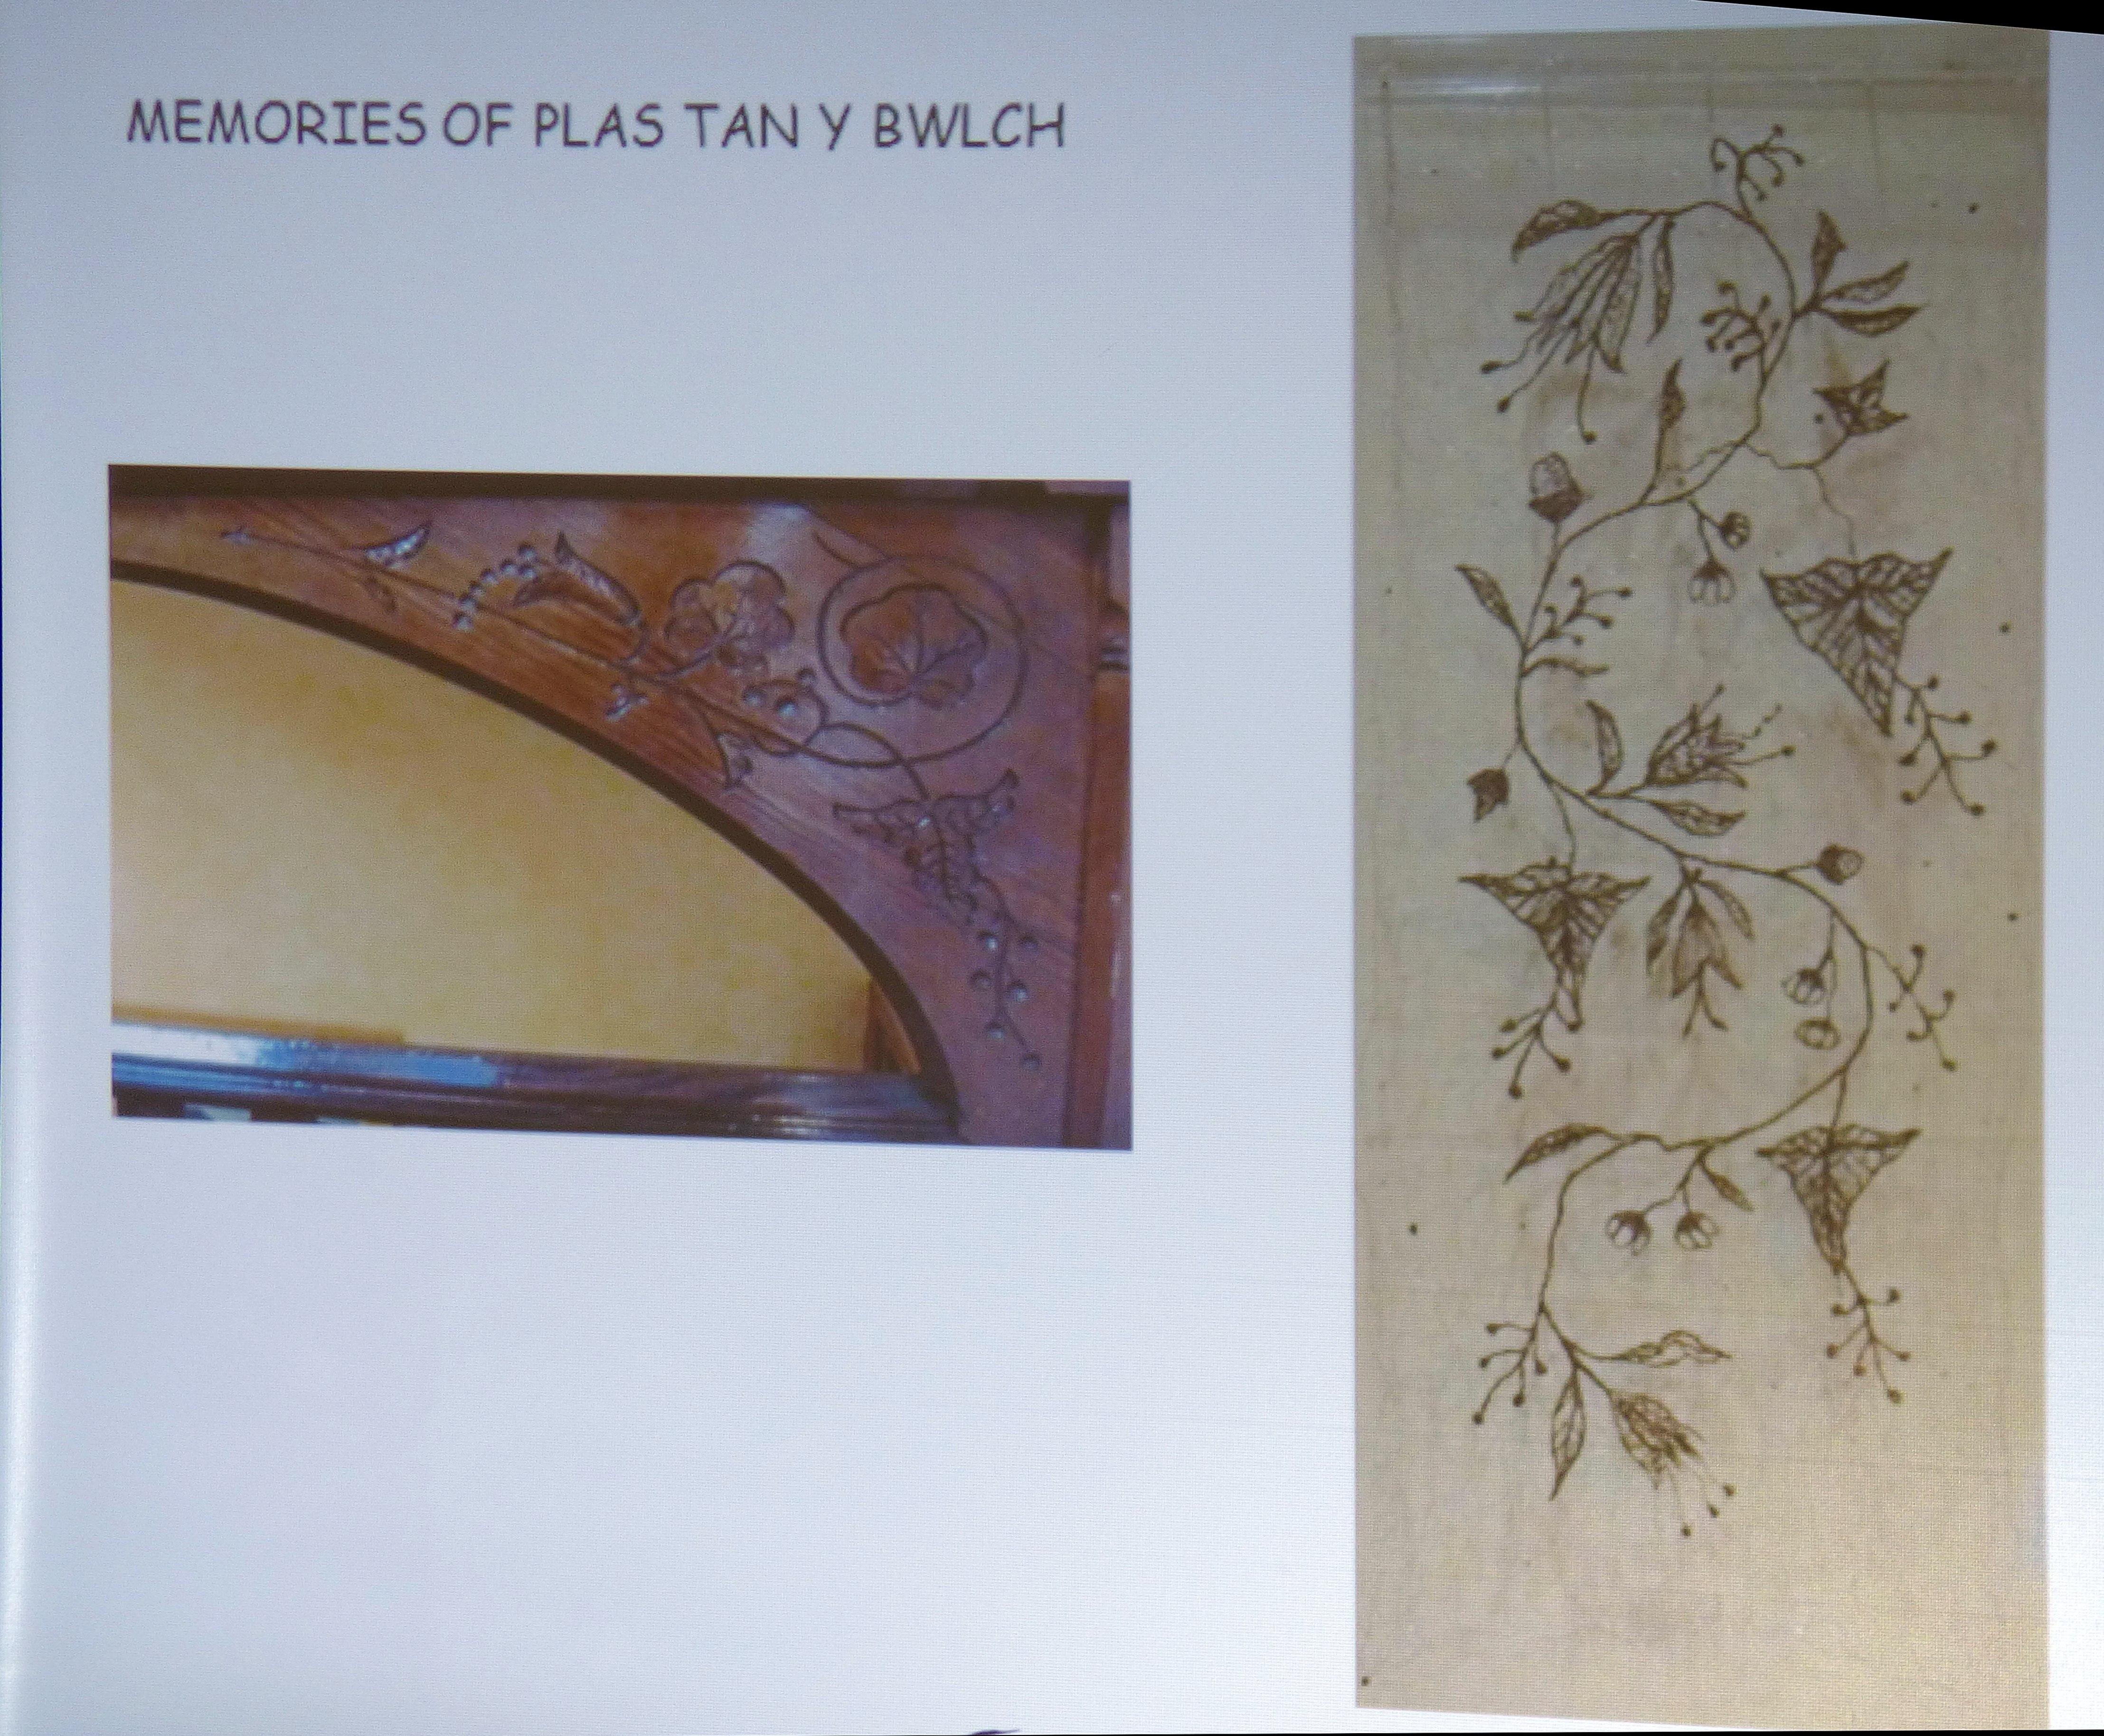 slide showing metal thread embroidery by Moya McCarthy, N.Wales EG